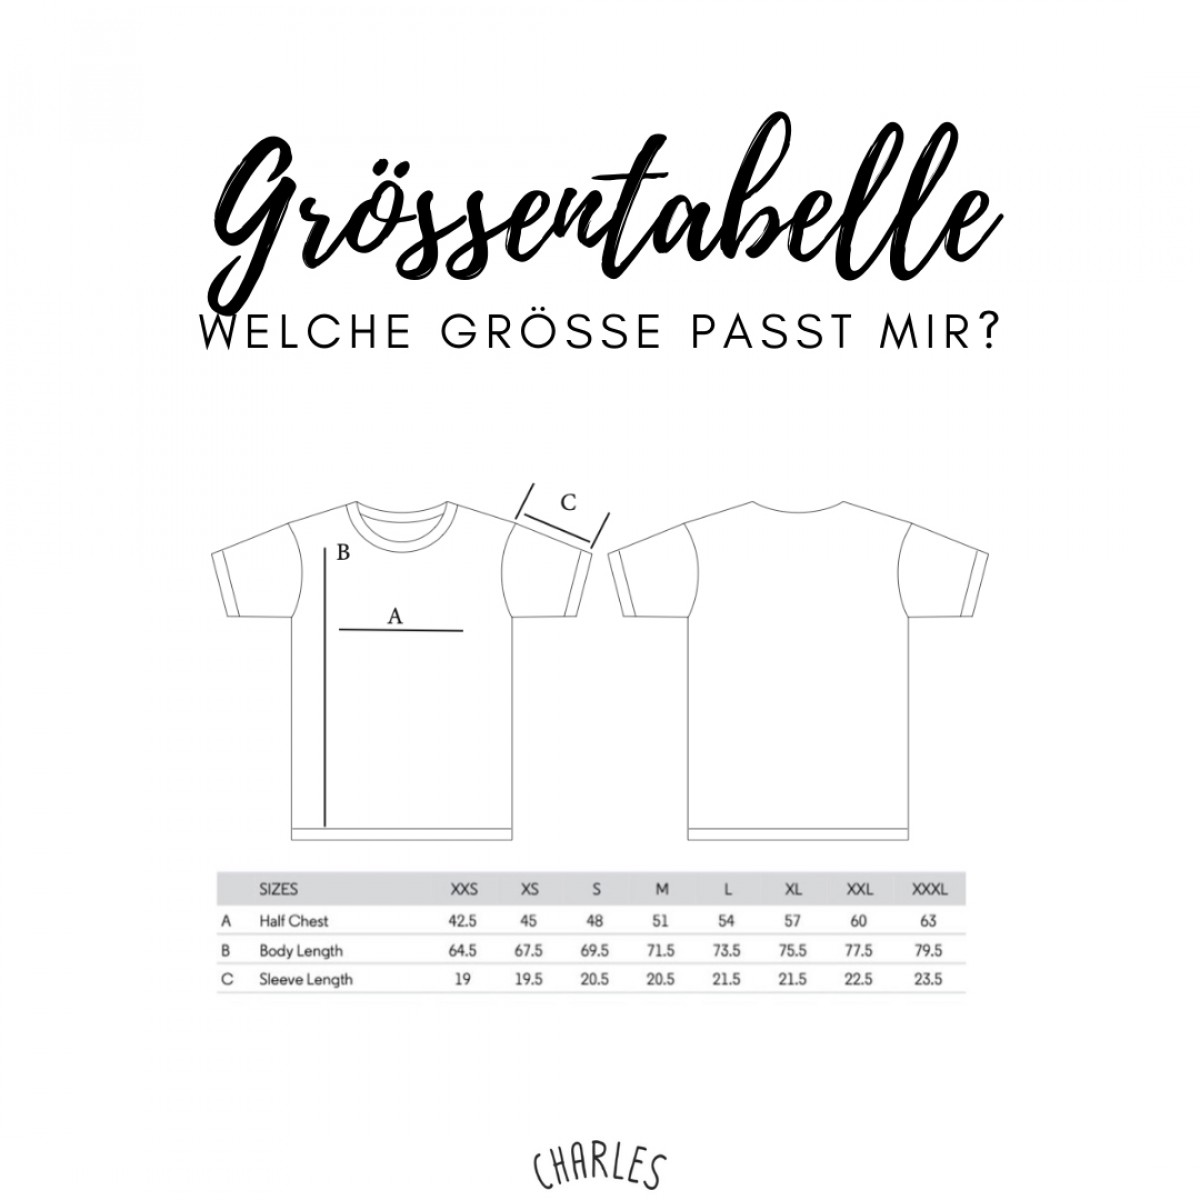 Charles / Shirt Bremen / 100% Biobaumwolle / Fair Wear zertifiziert